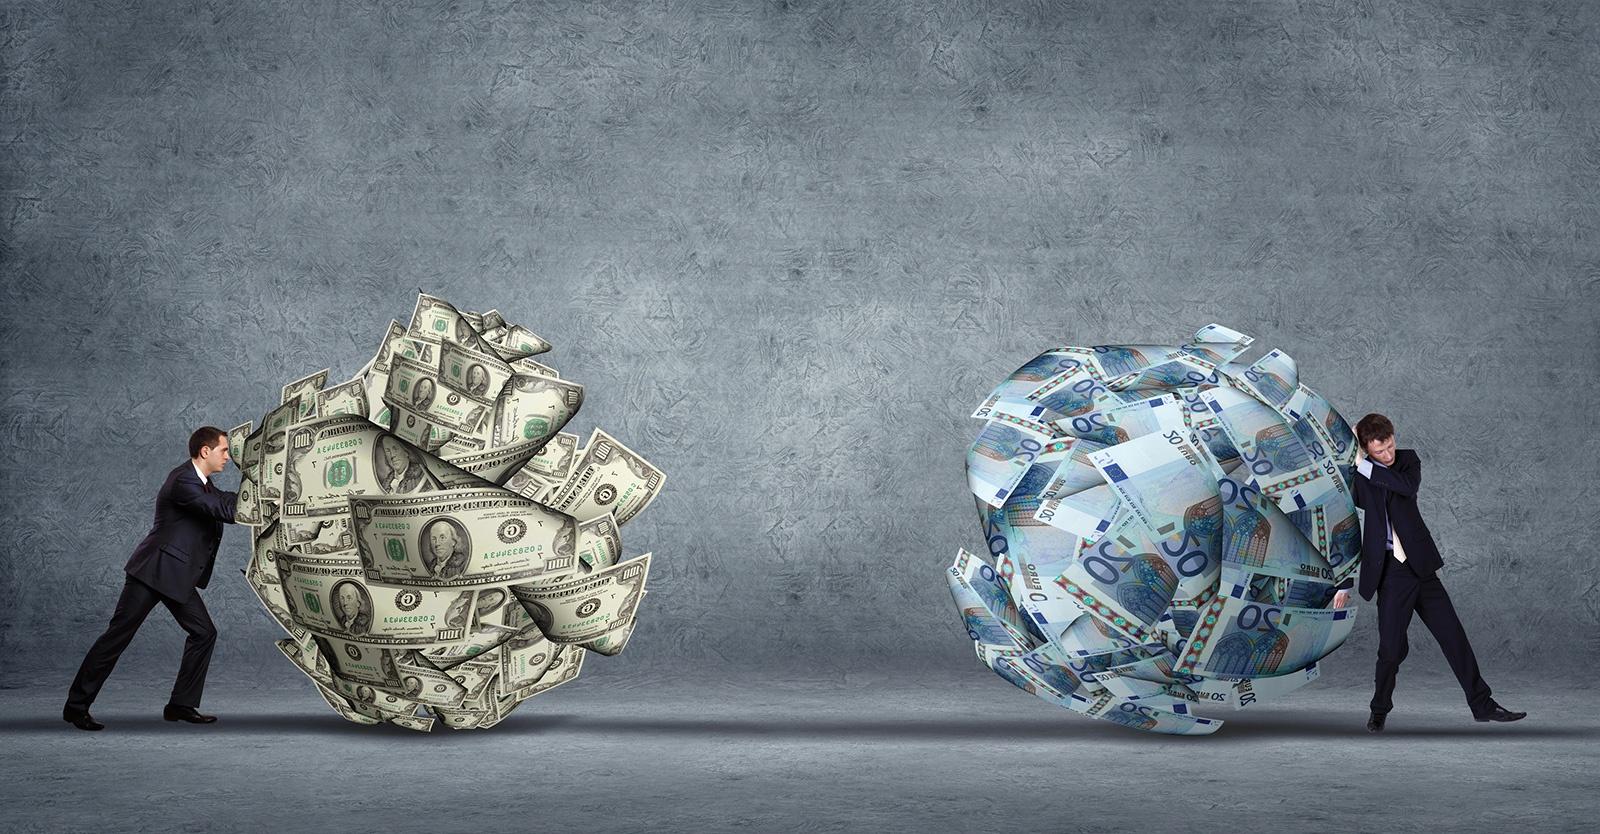 valuutat-blogi-visio-1-18.jpg